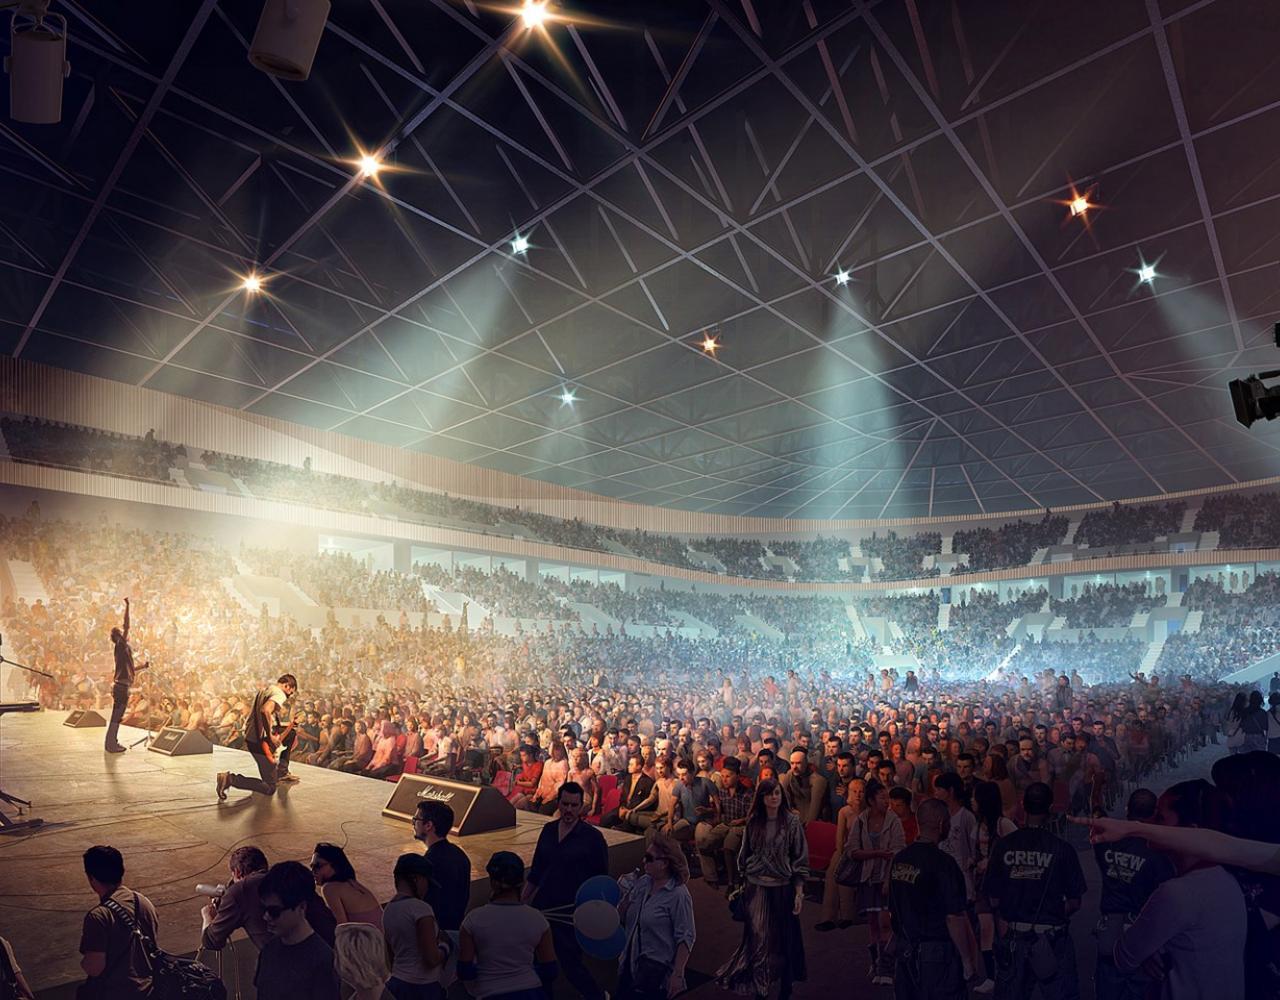 koncert royal arena